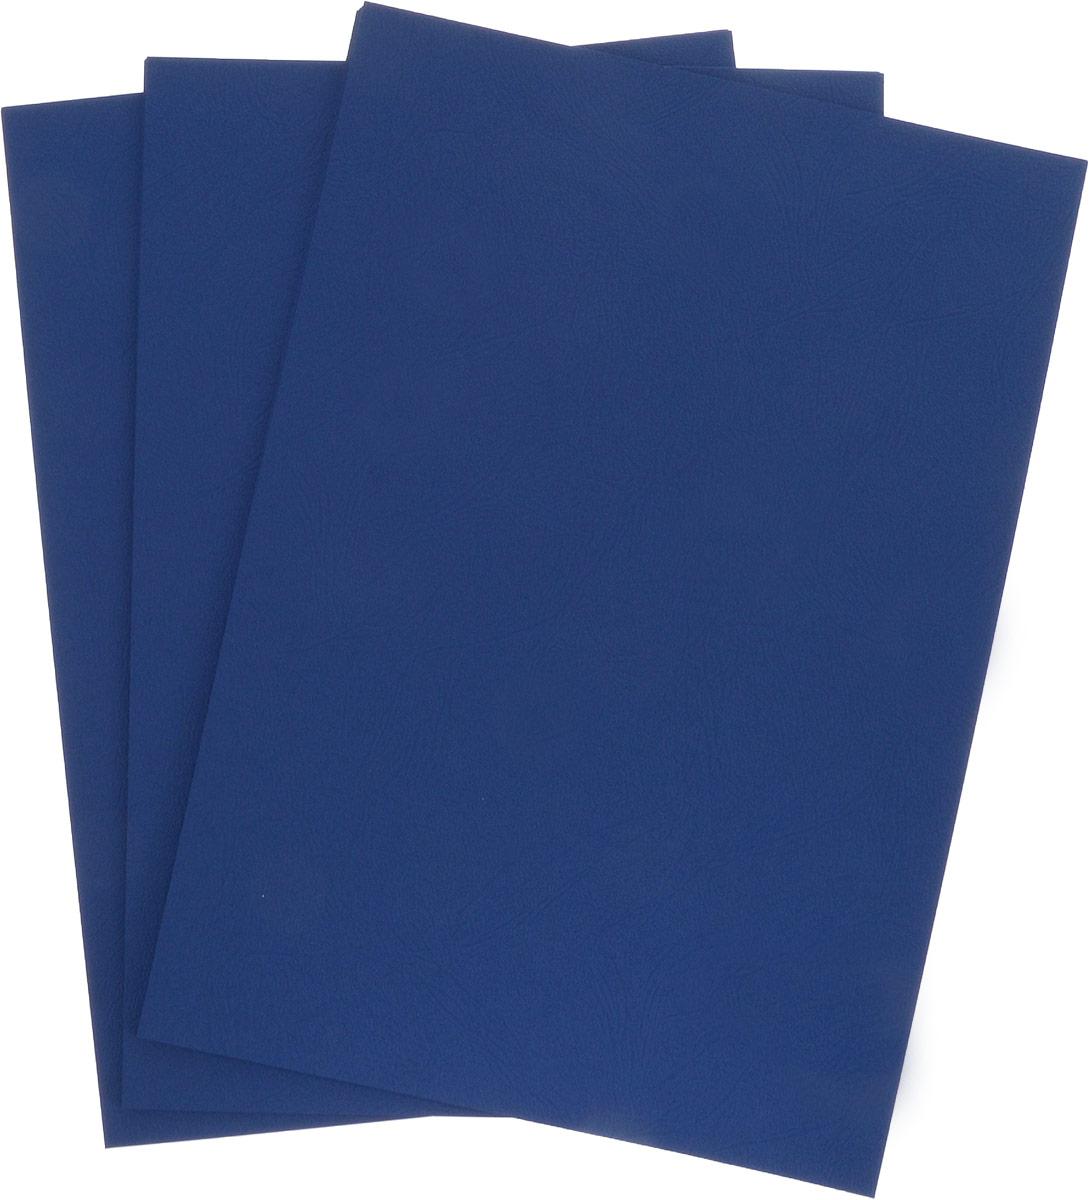 Fellowes FS-53739 Delta A4, Blue обложка для переплета (25 шт) обложка для переплета fellowes fs 5370001